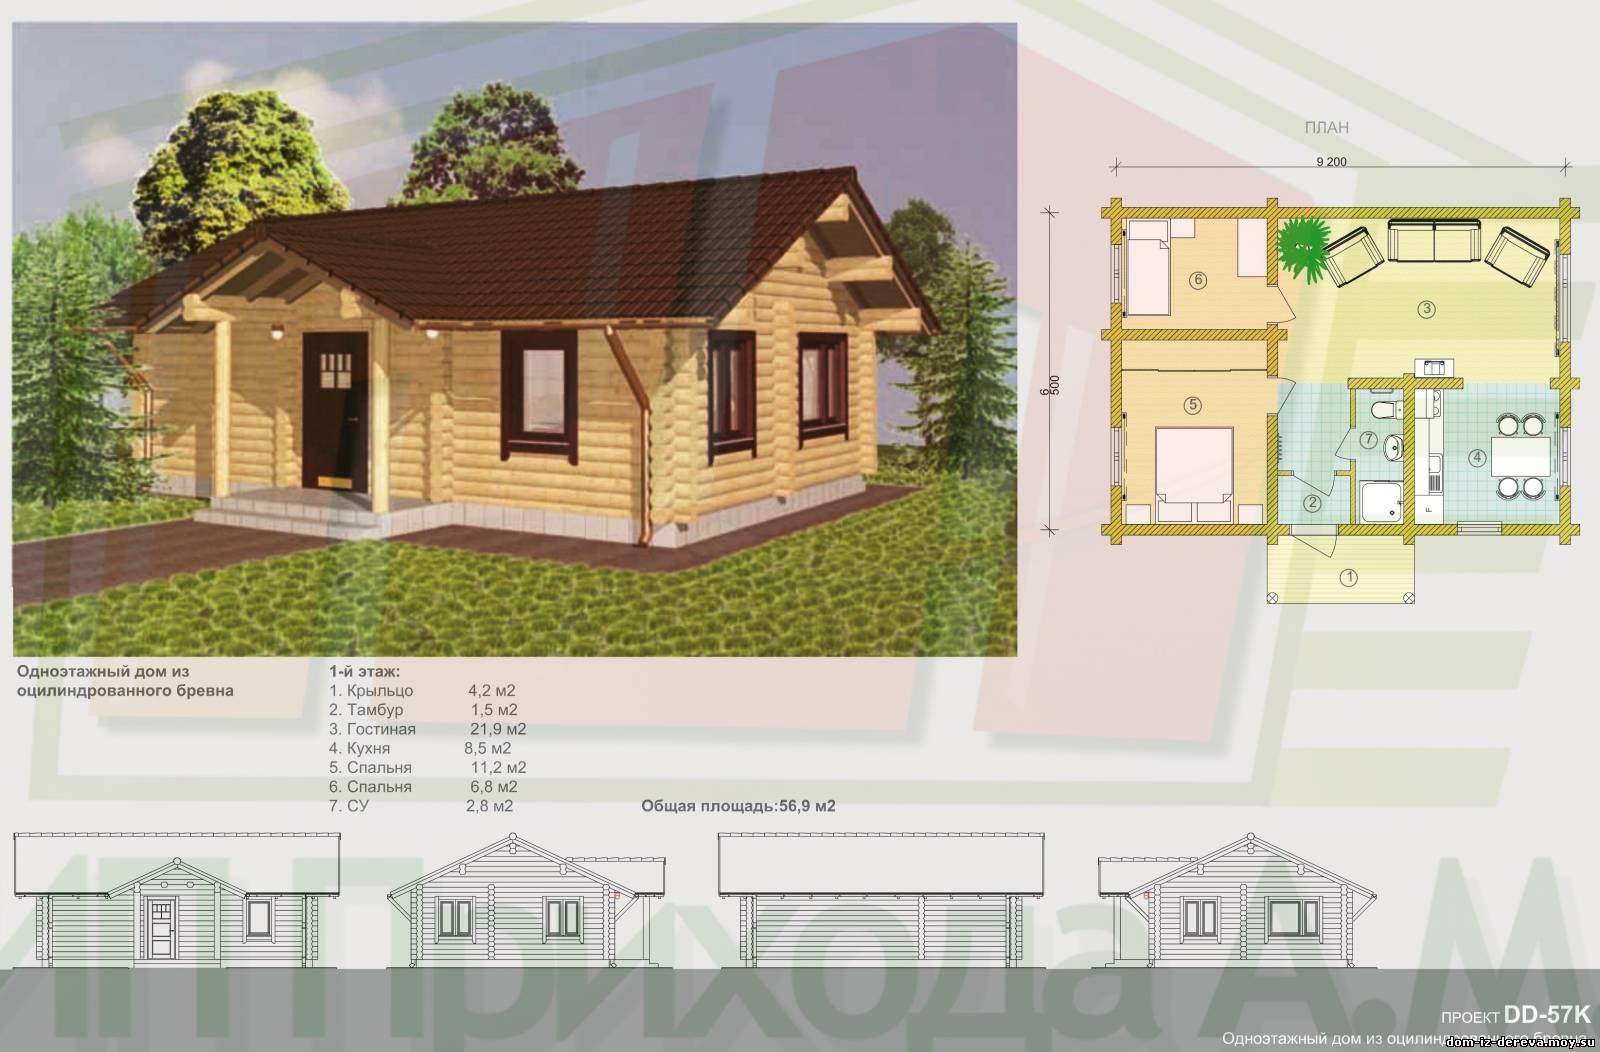 16 05 2011 проект дома площадью 57 квм tis pam